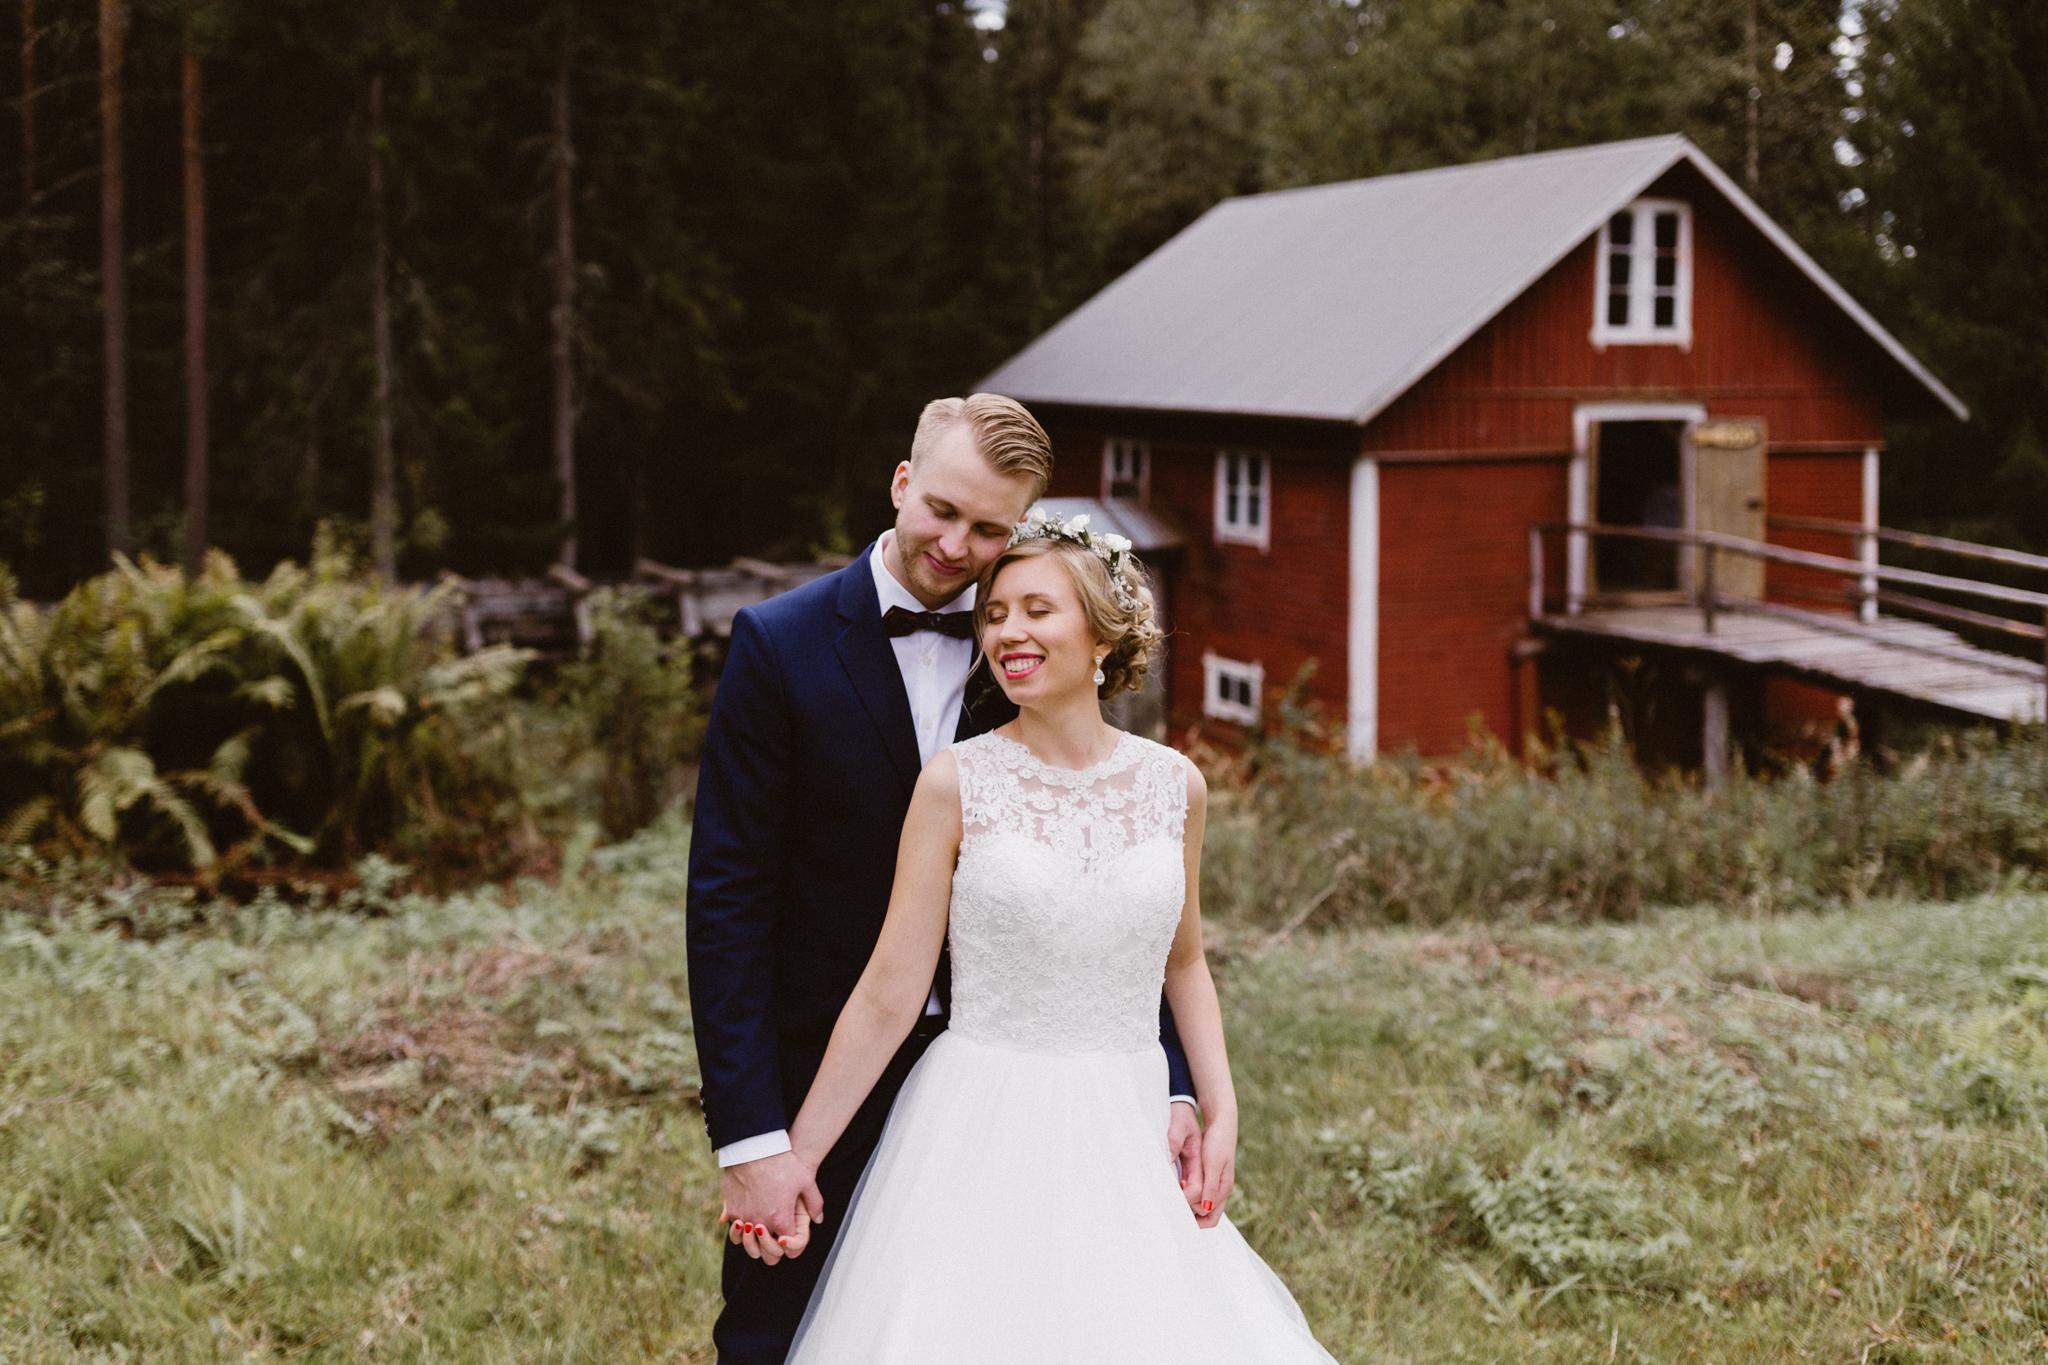 Leevi + Susanna -- Patrick Karkkolainen Wedding Photographer-247.jpg